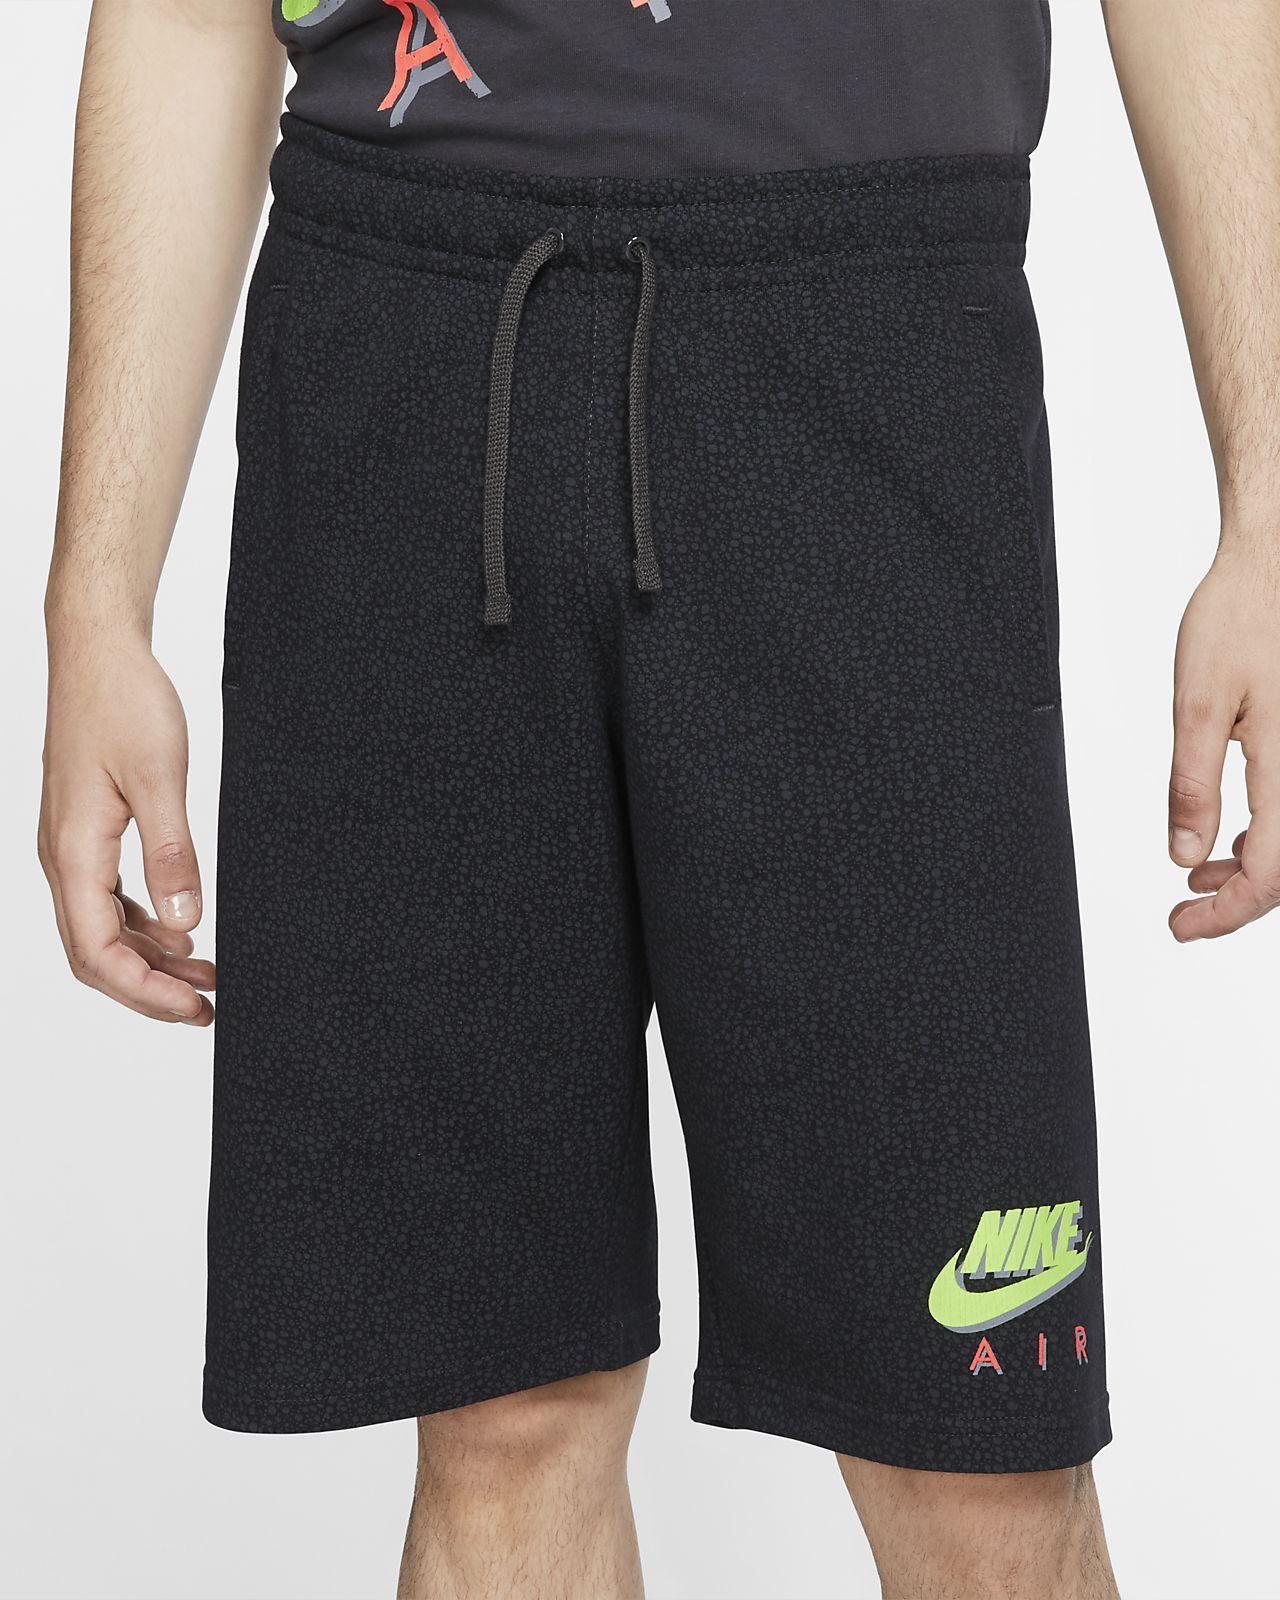 Nike Sportswear Men's Printed Shorts